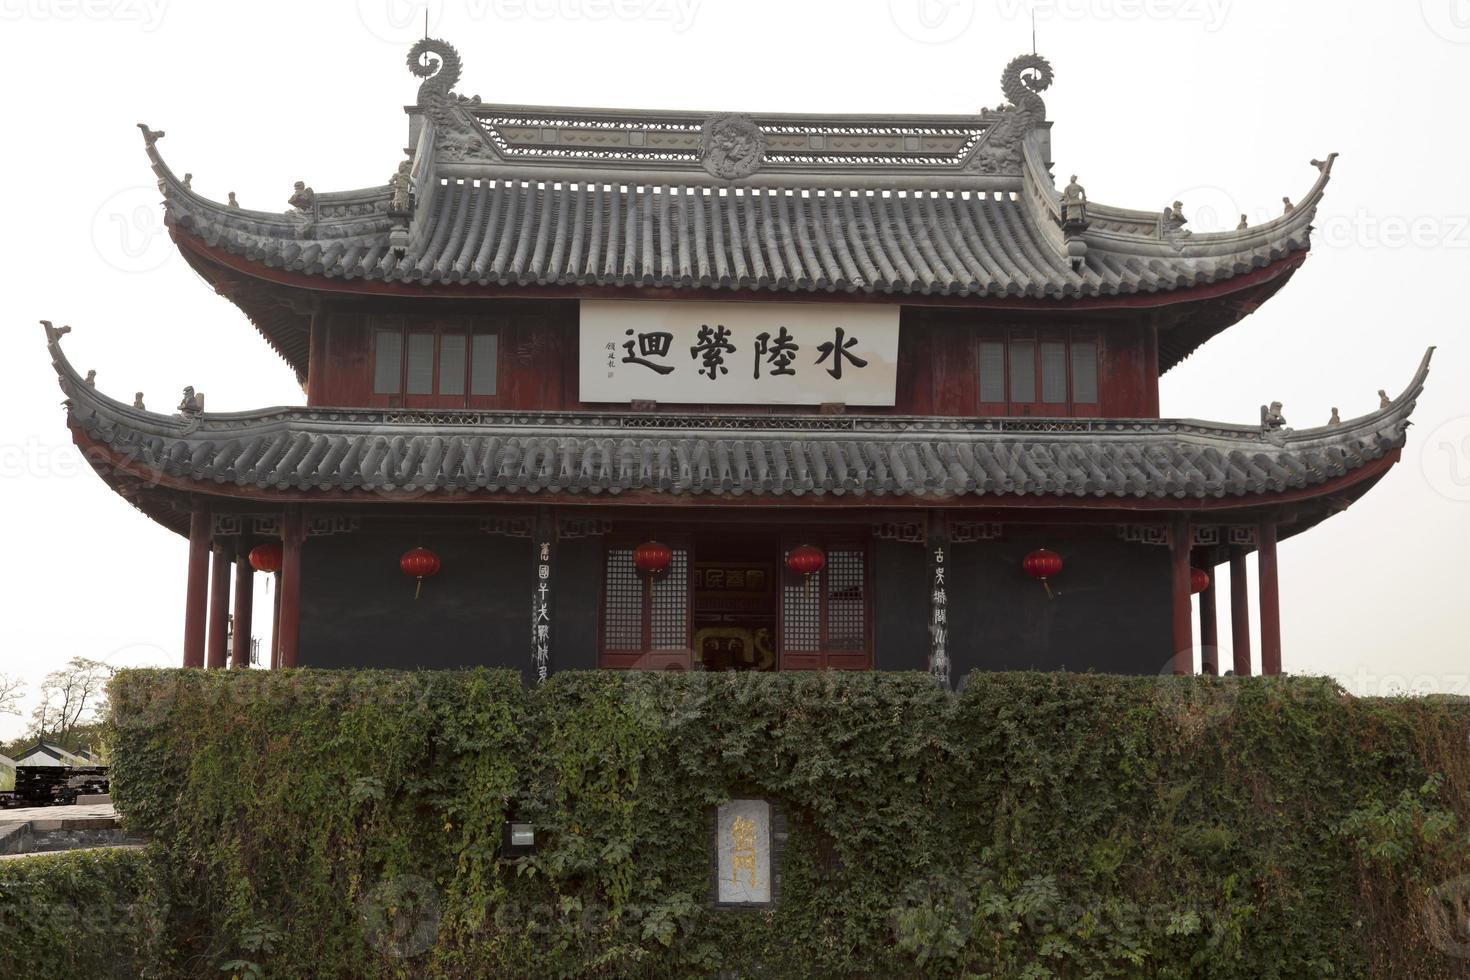 pan mannen waterpoort oude Chinese paviljoen suzhou china foto